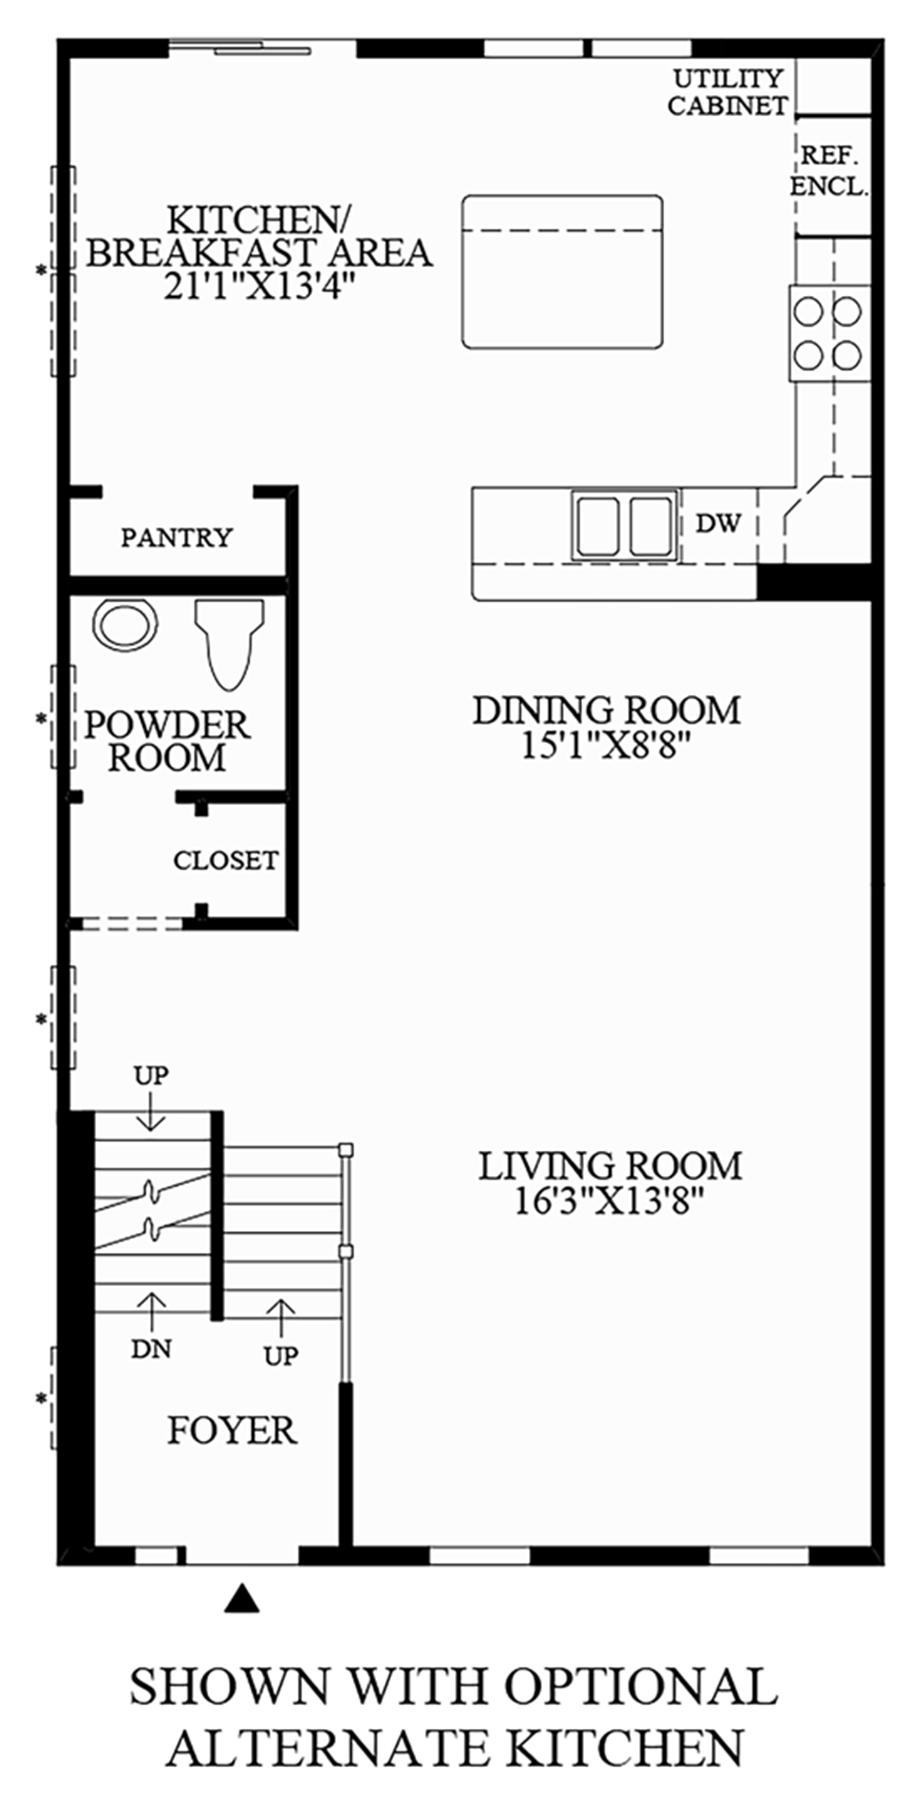 Optional Alternate Kitchen Floor Plan